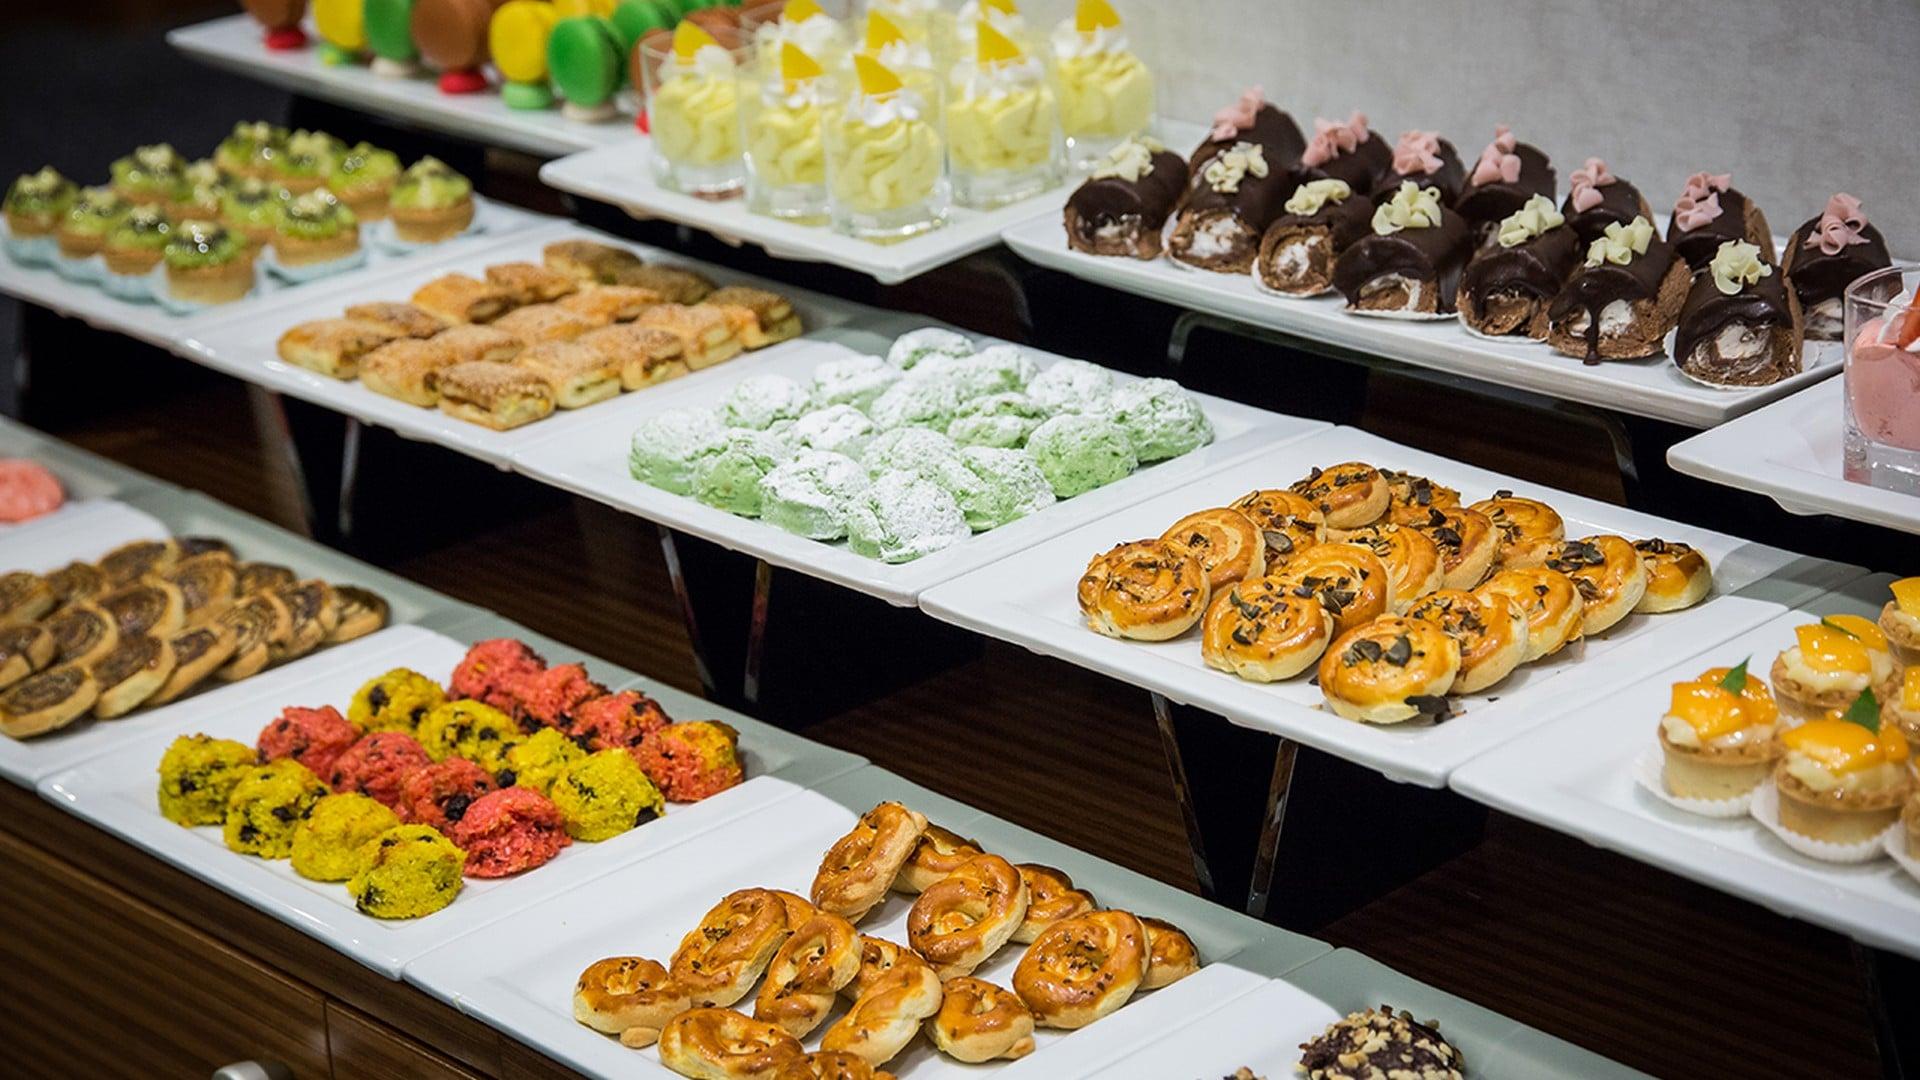 Midtown Hotel More Restaurant Buffet